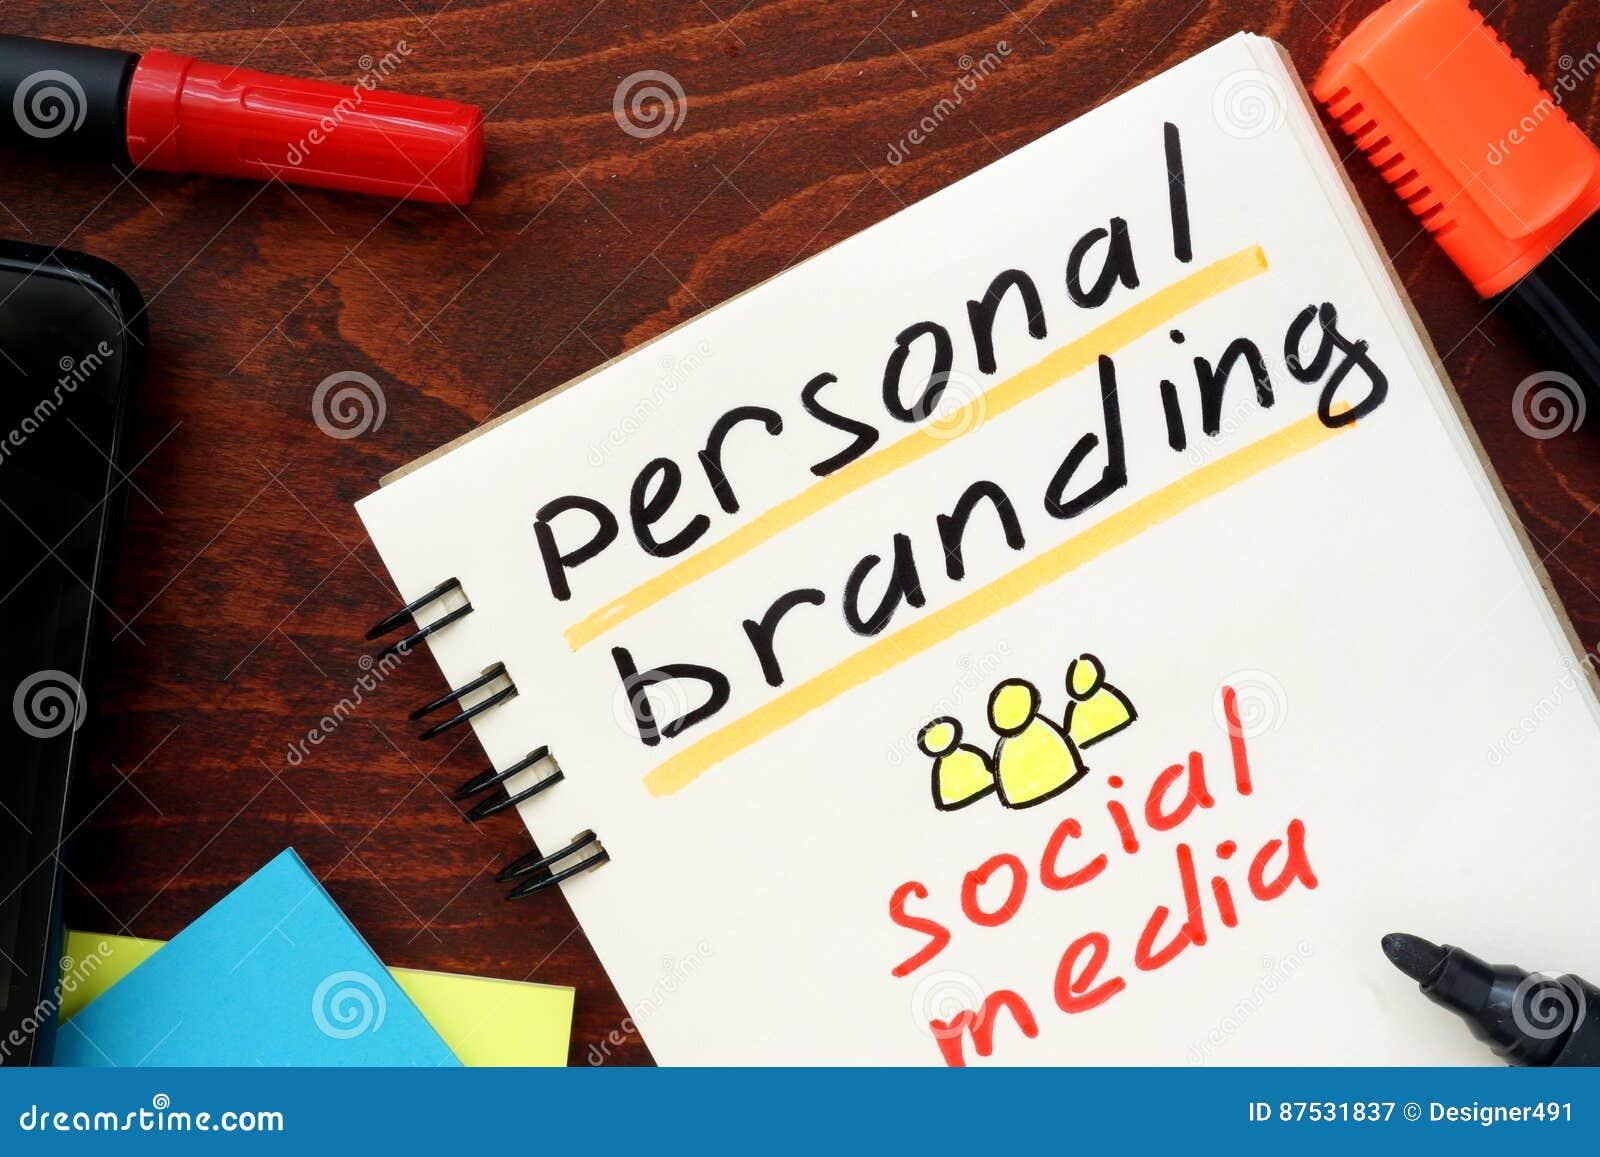 Personal Branding.